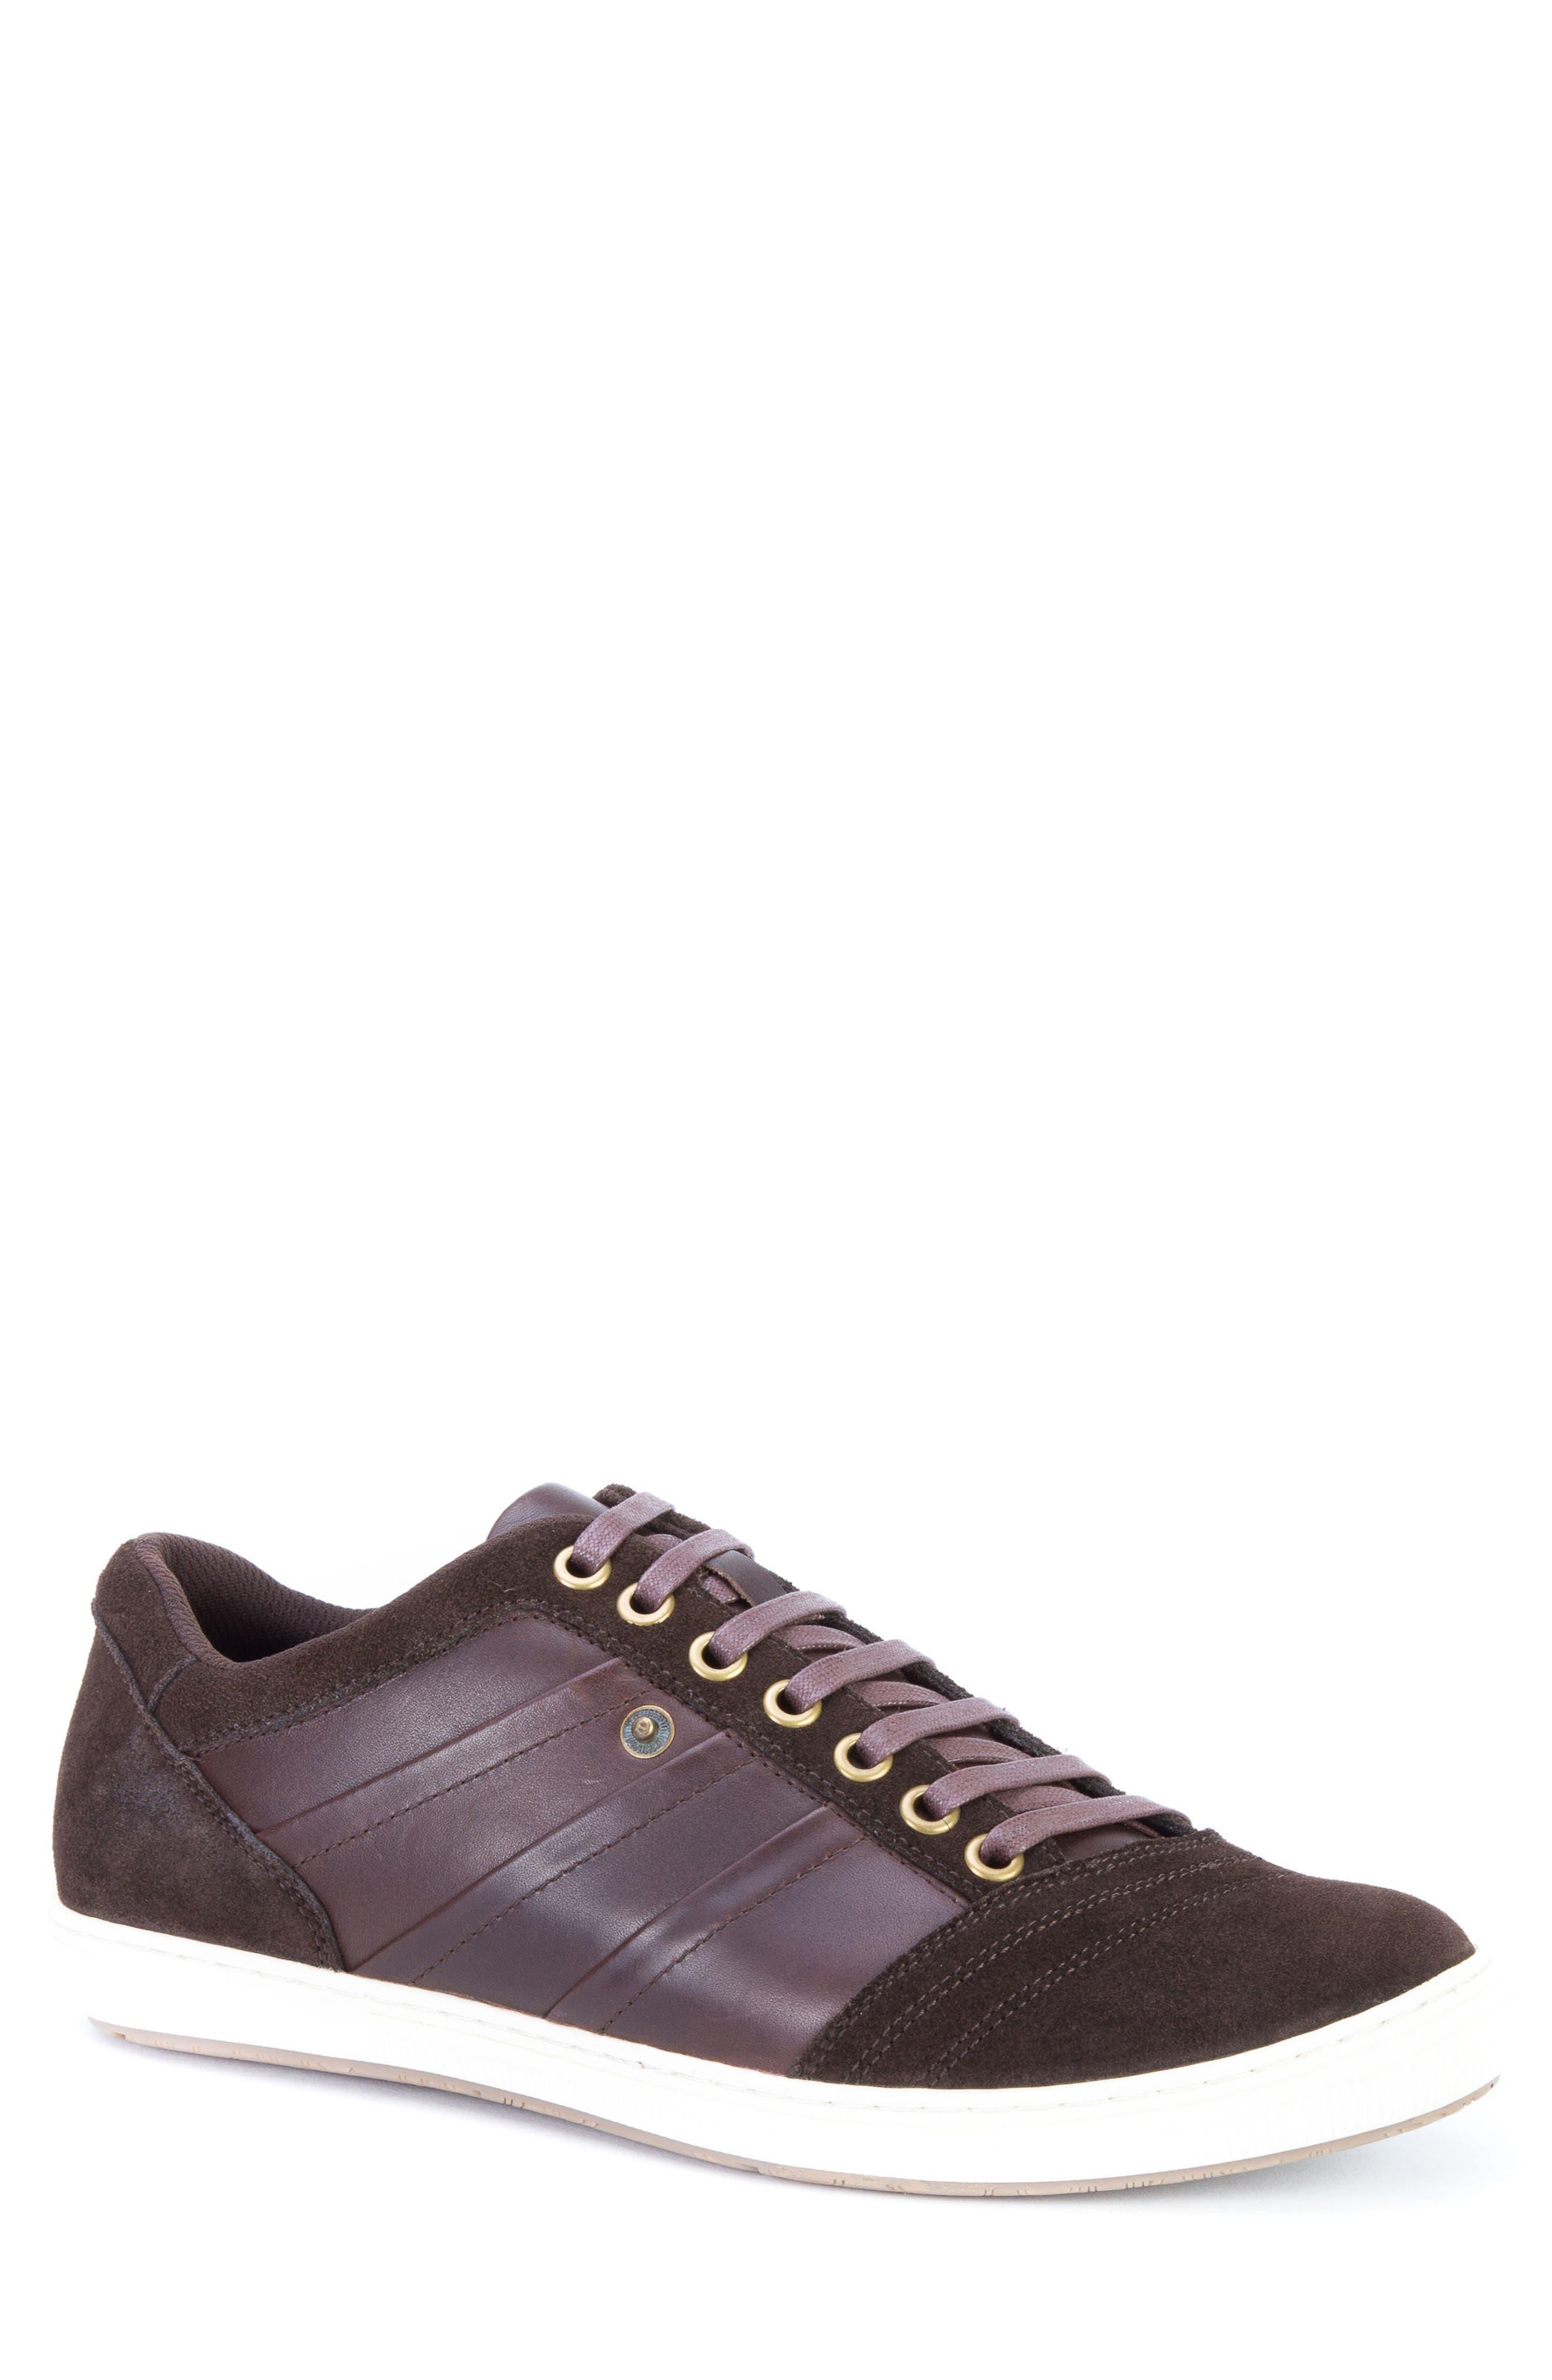 Alternate Image 1 Selected - Zanzara Jive Sneaker (Men)